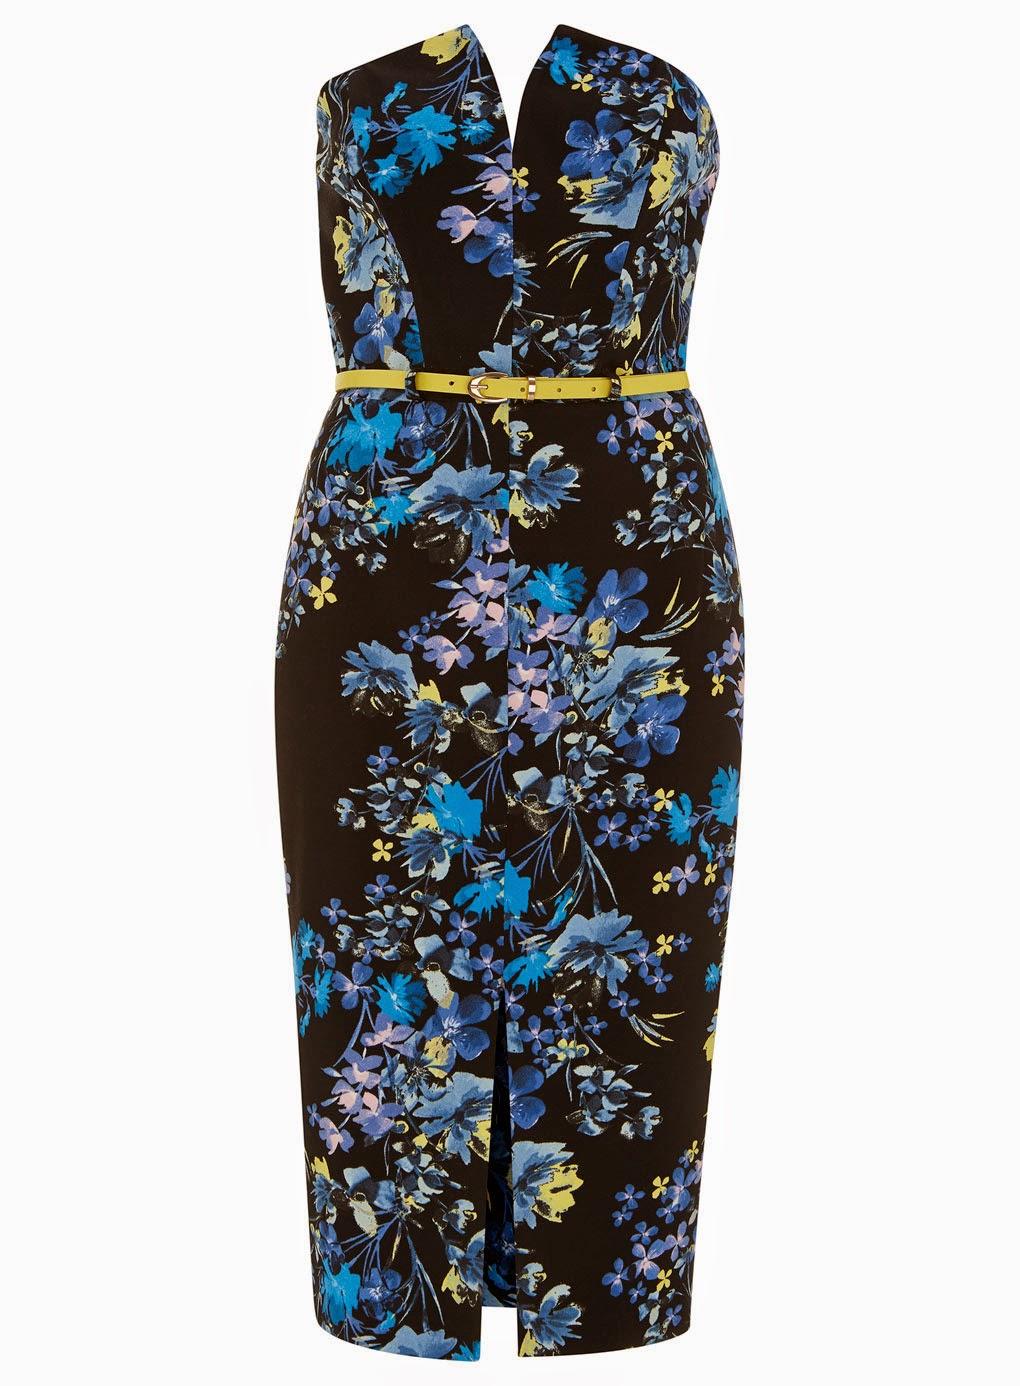 black and blue floral dress, floral sleeveless dress, miss selfridge floral dress,